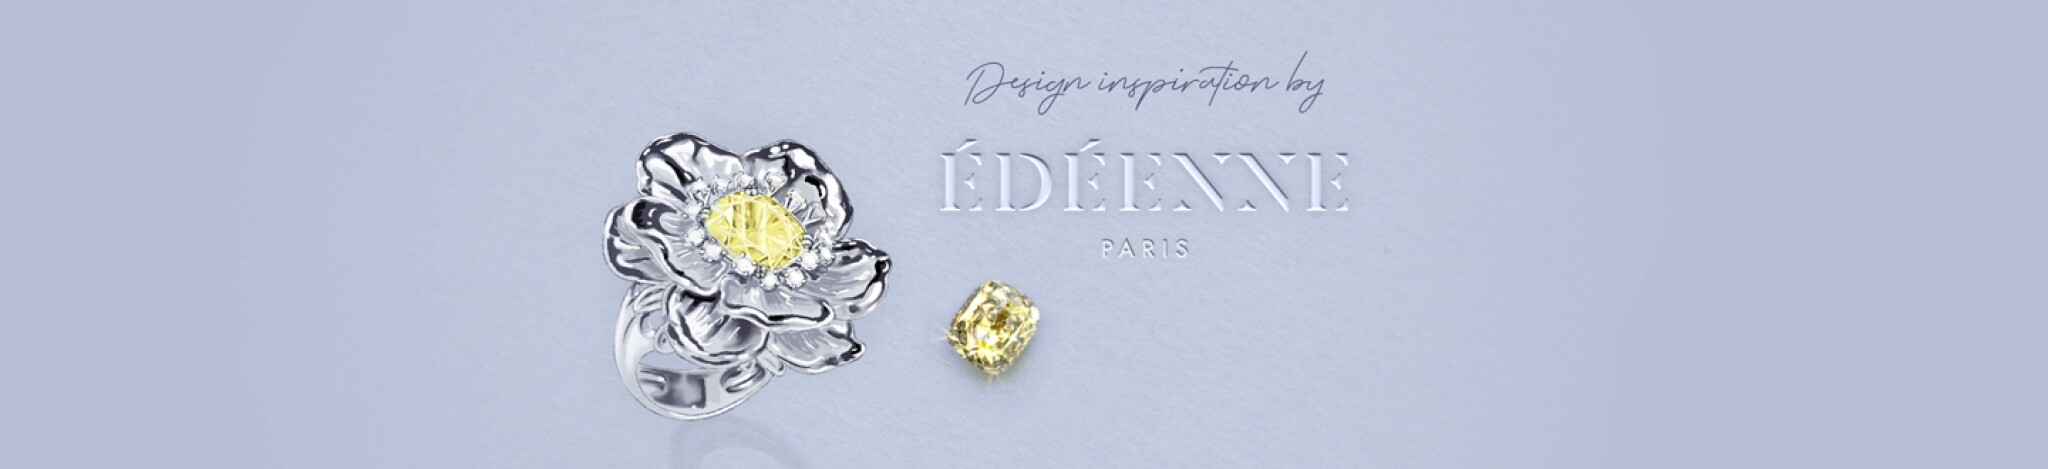 Diamonds Online | Capsule Collection